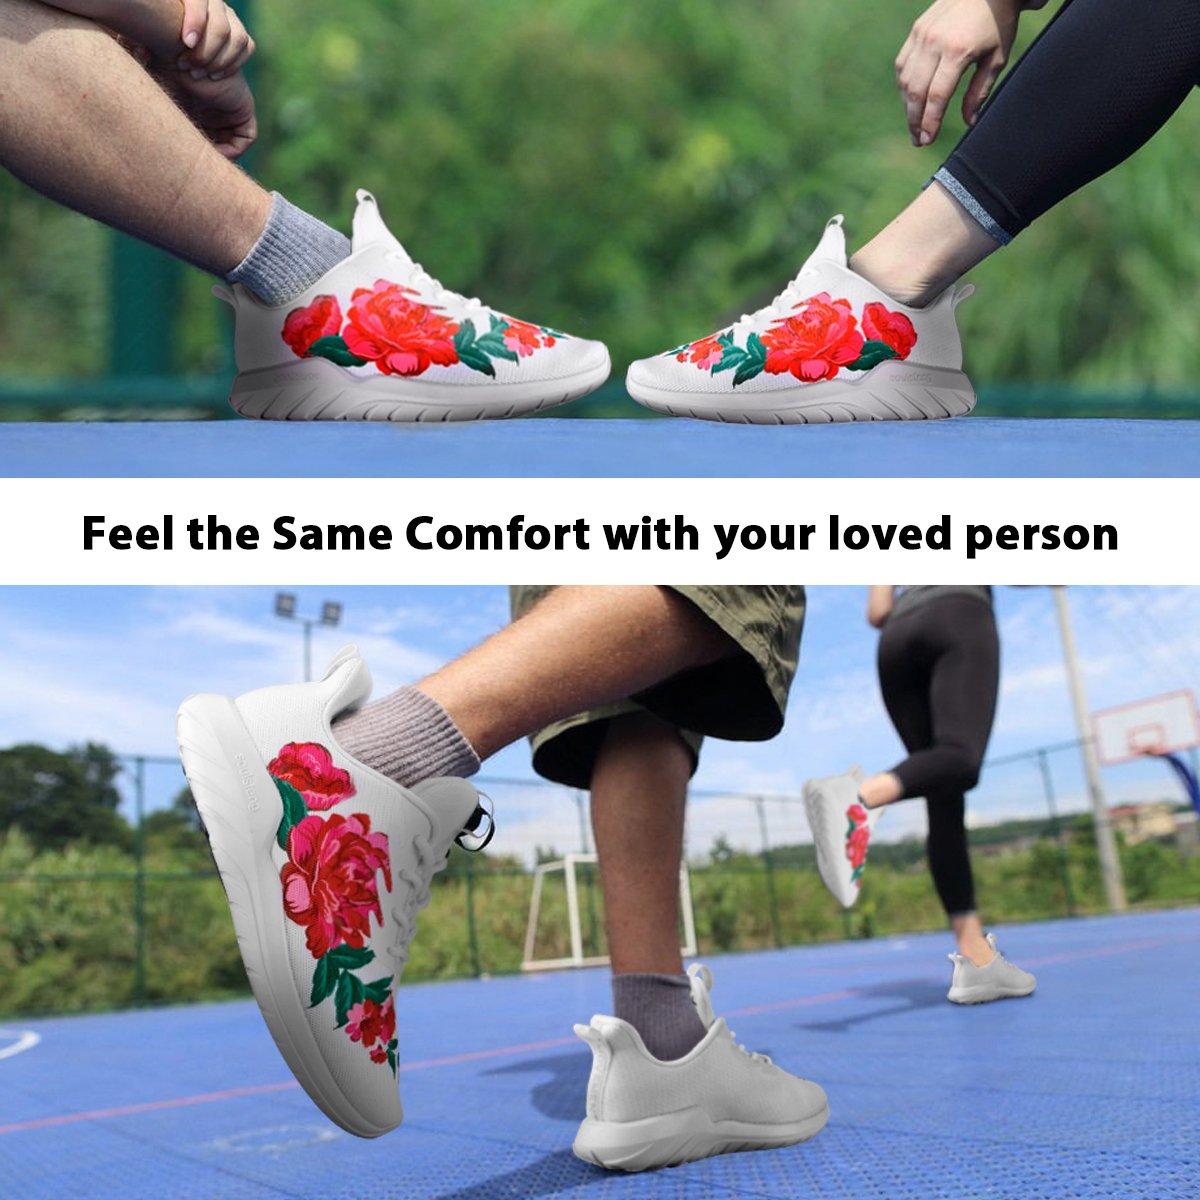 Running Shoes Men Women Wide Sneakers for Boys Girls Youth, Lightweight Shoes B075YSWKLG Women 6.5 B(M)US=EUR37=23.5CM|Big Flower